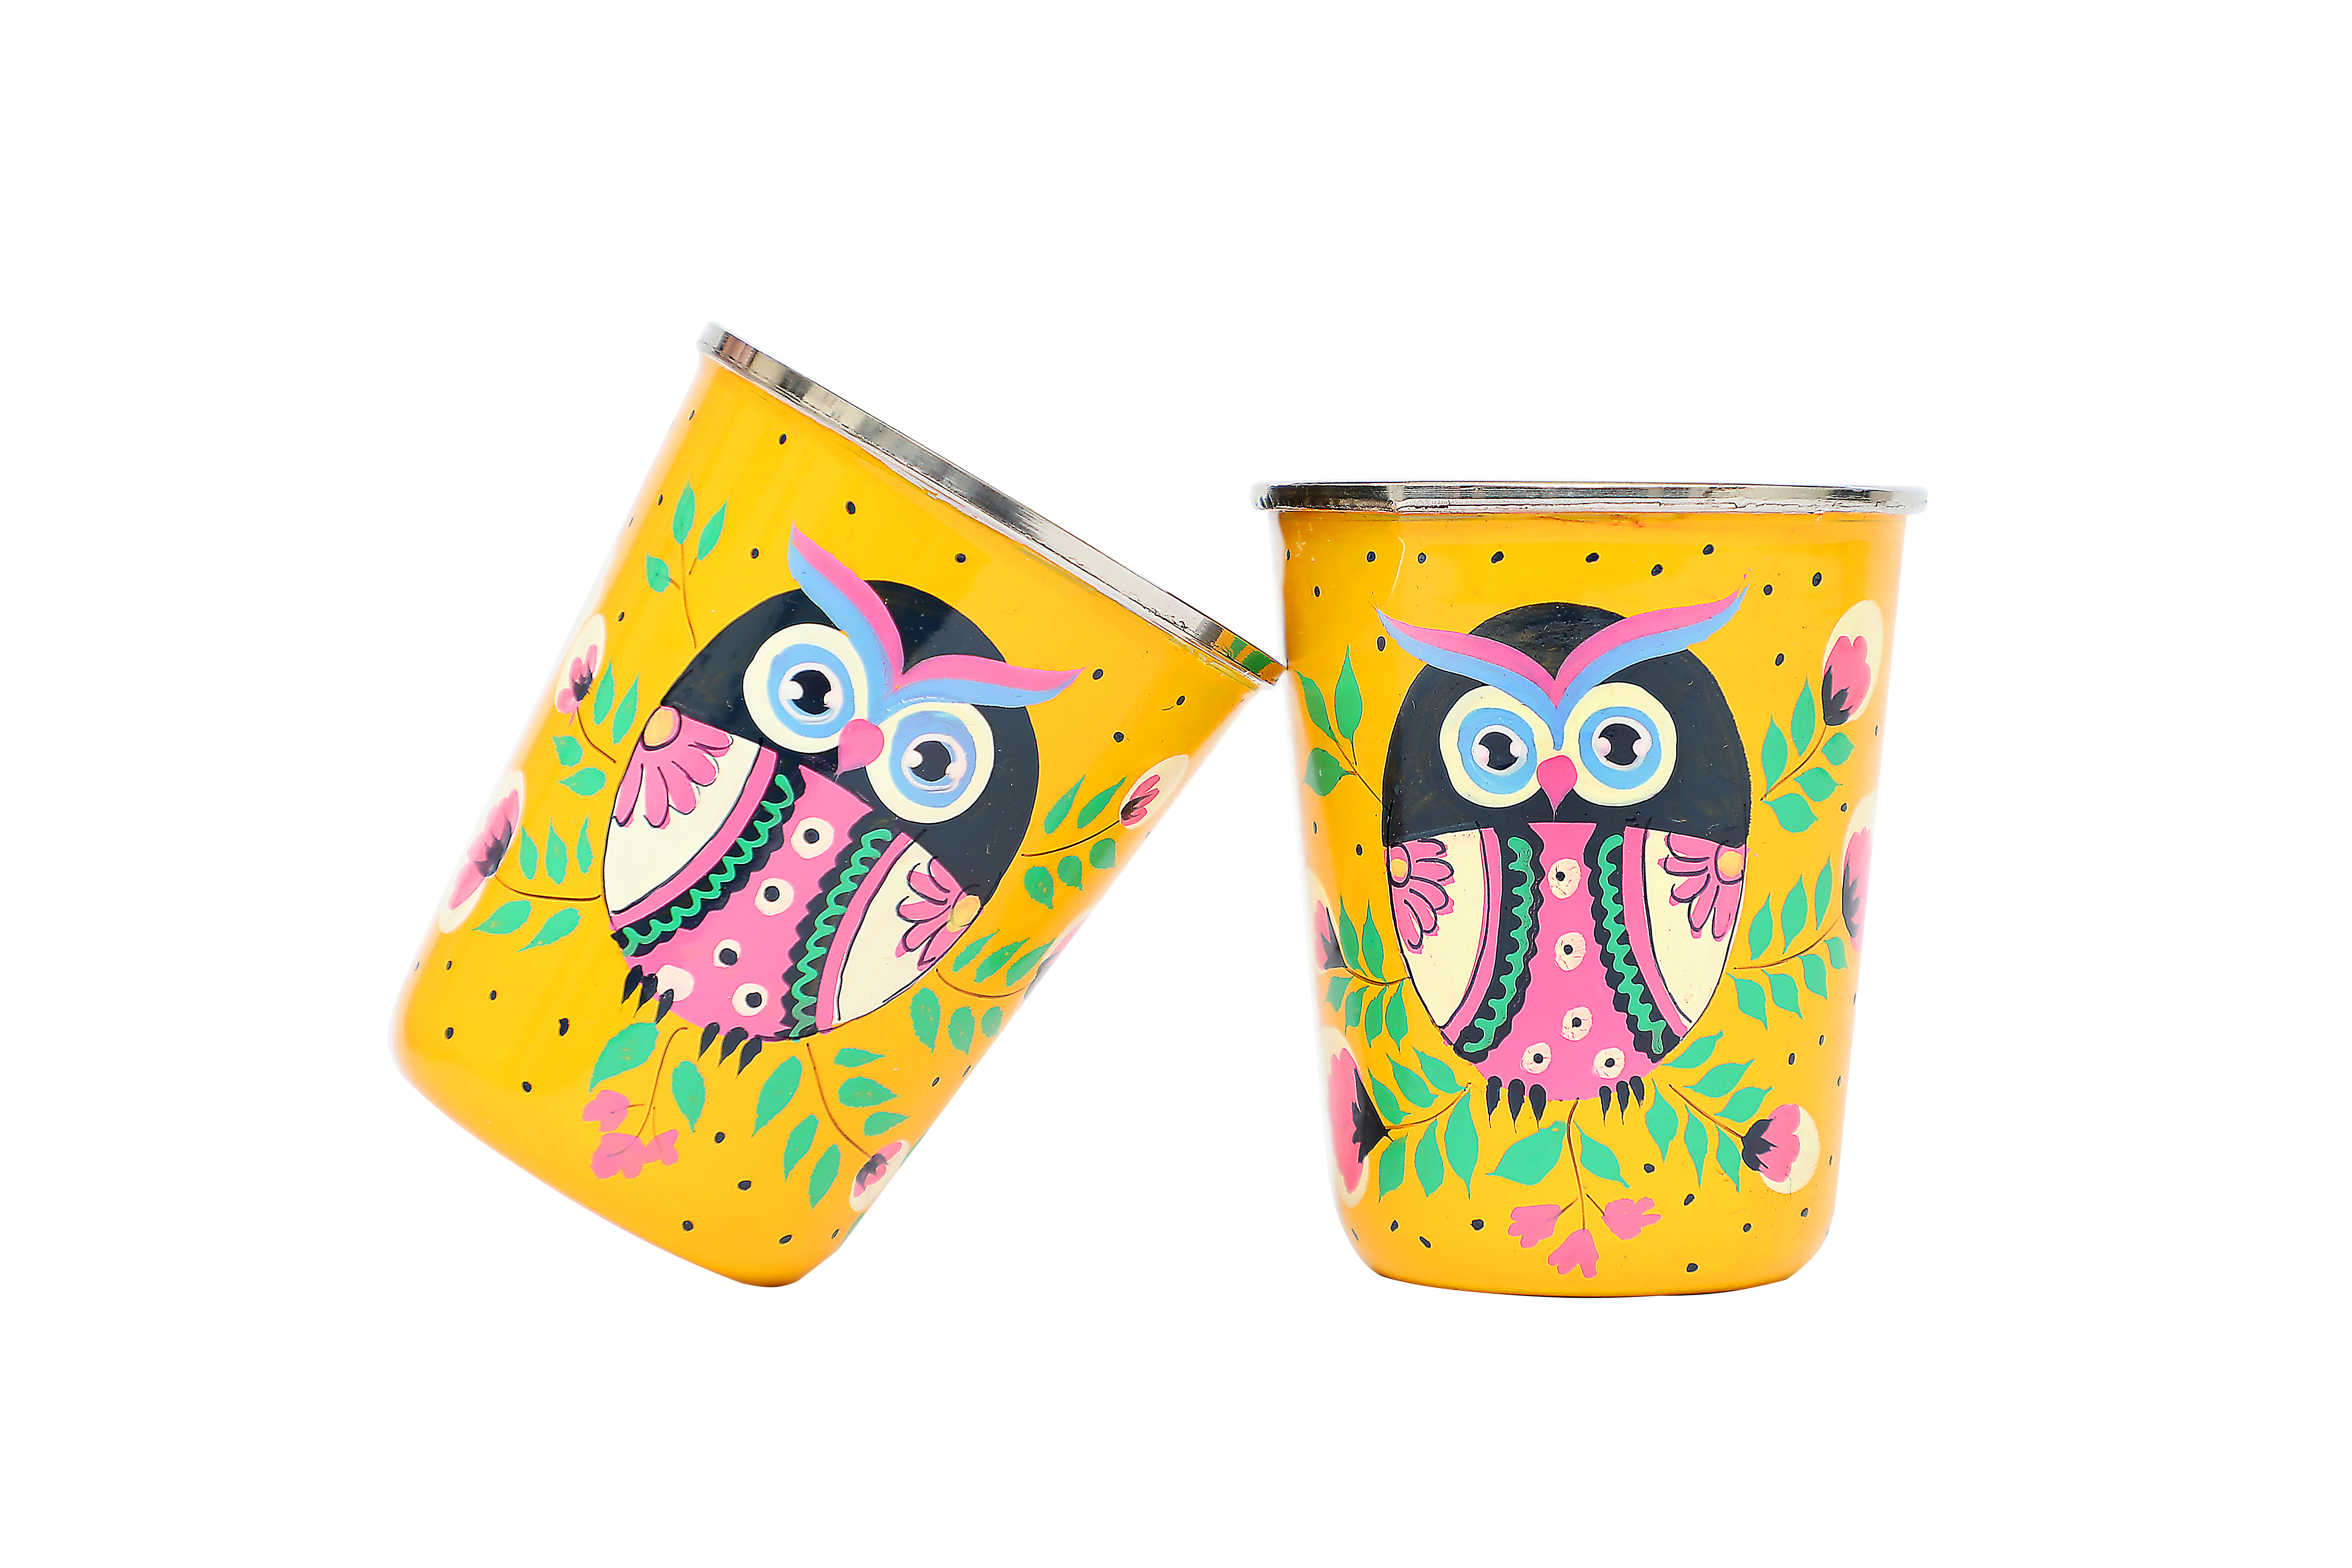 Stainless Steel Tumbler Small - Owl Eye Yellow